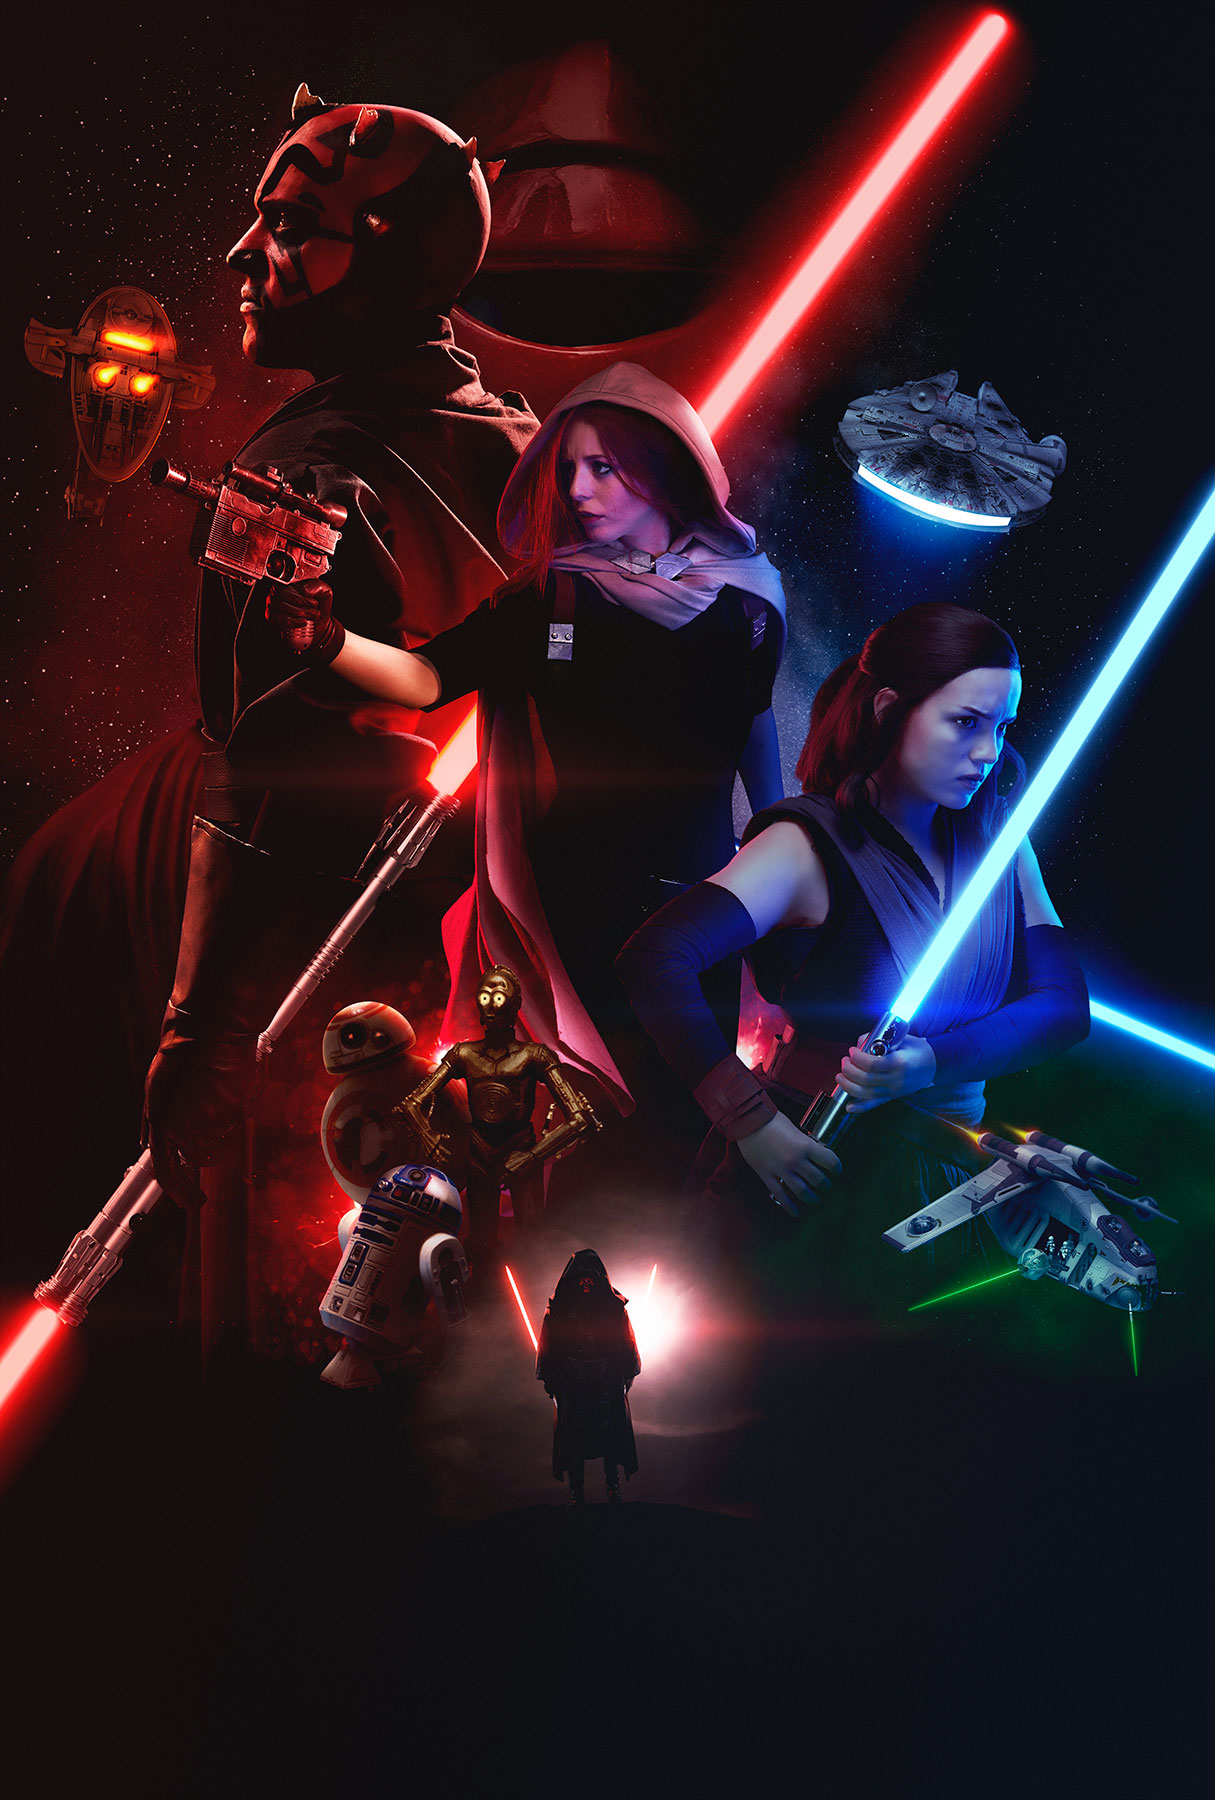 Sayanoff Arthur Star Wars Poster 02 15